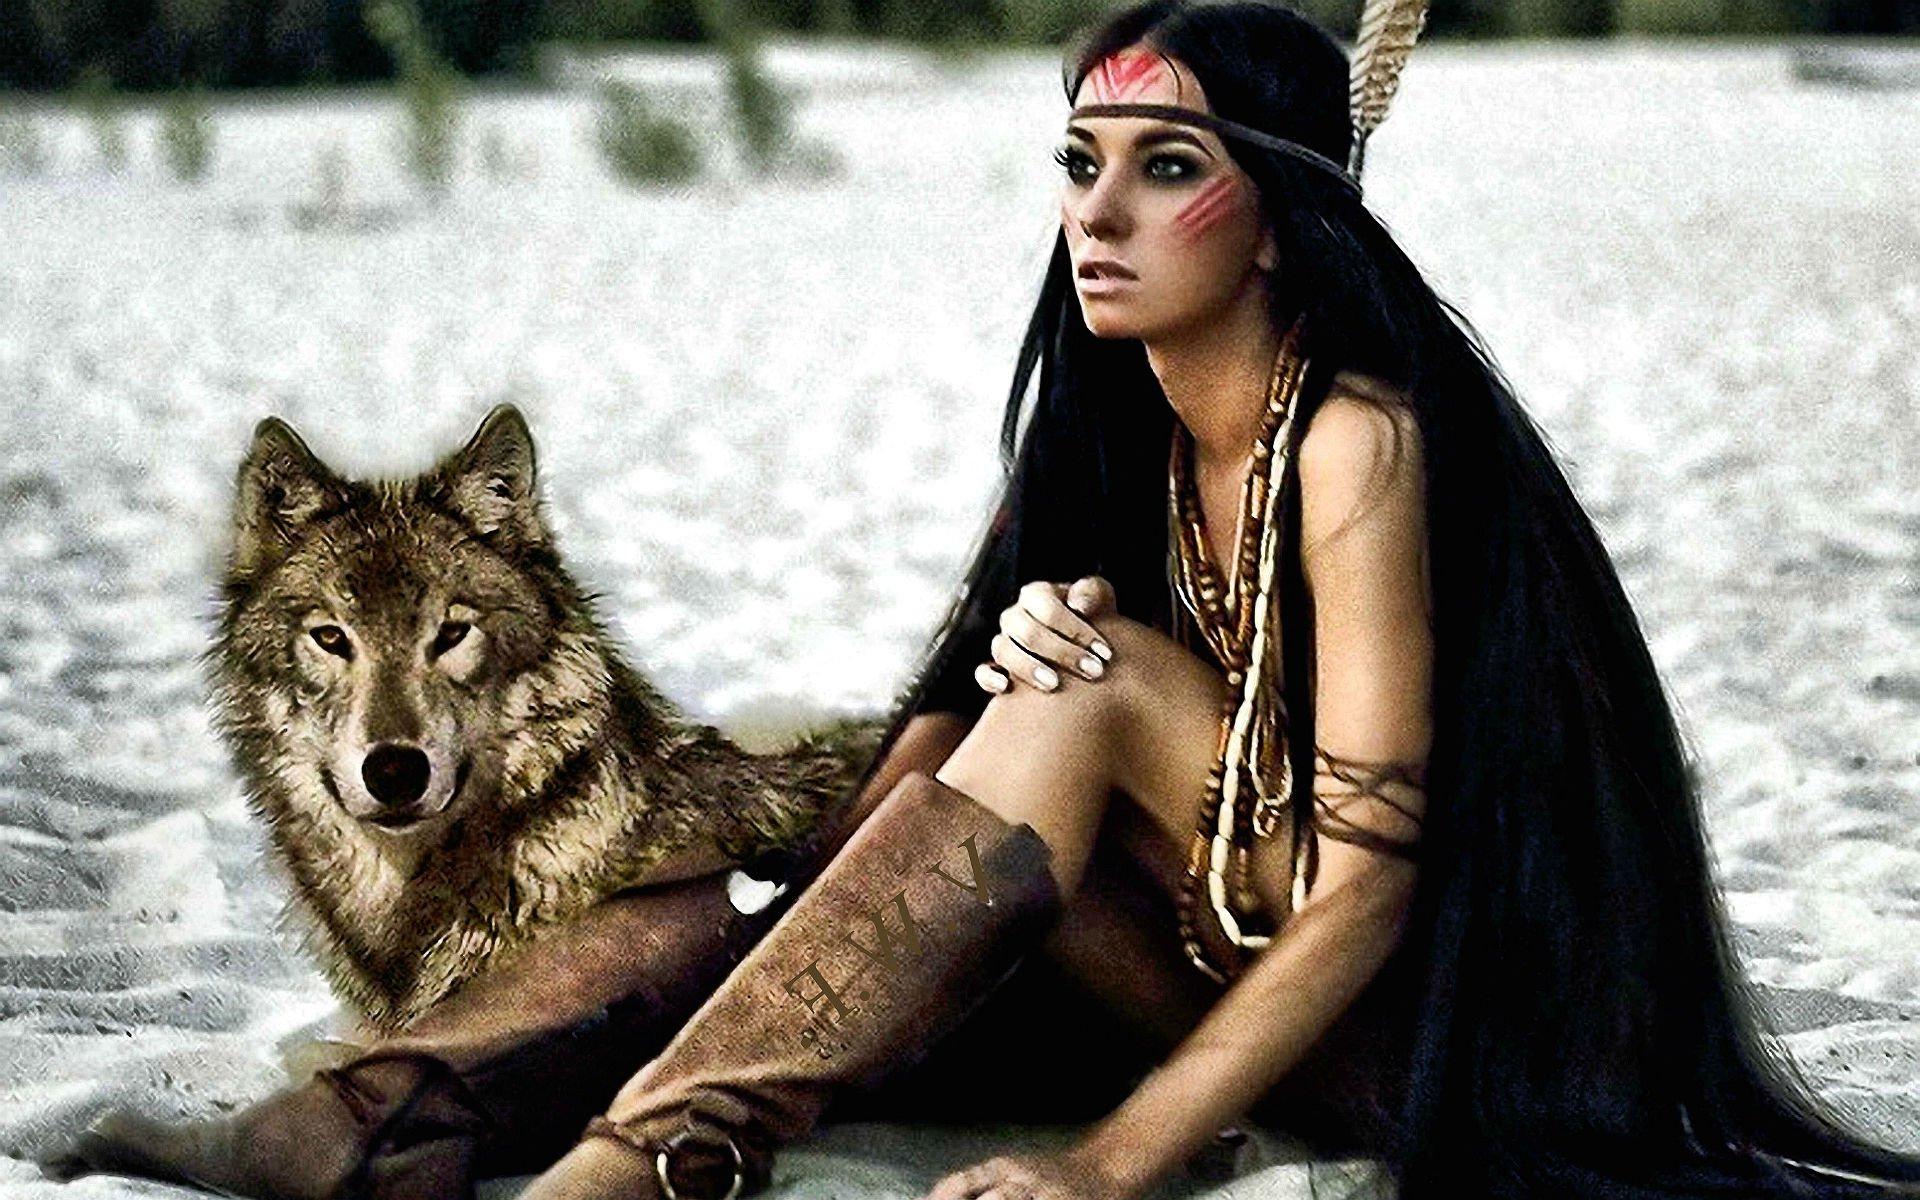 Красивые фотографии со шкурой волка